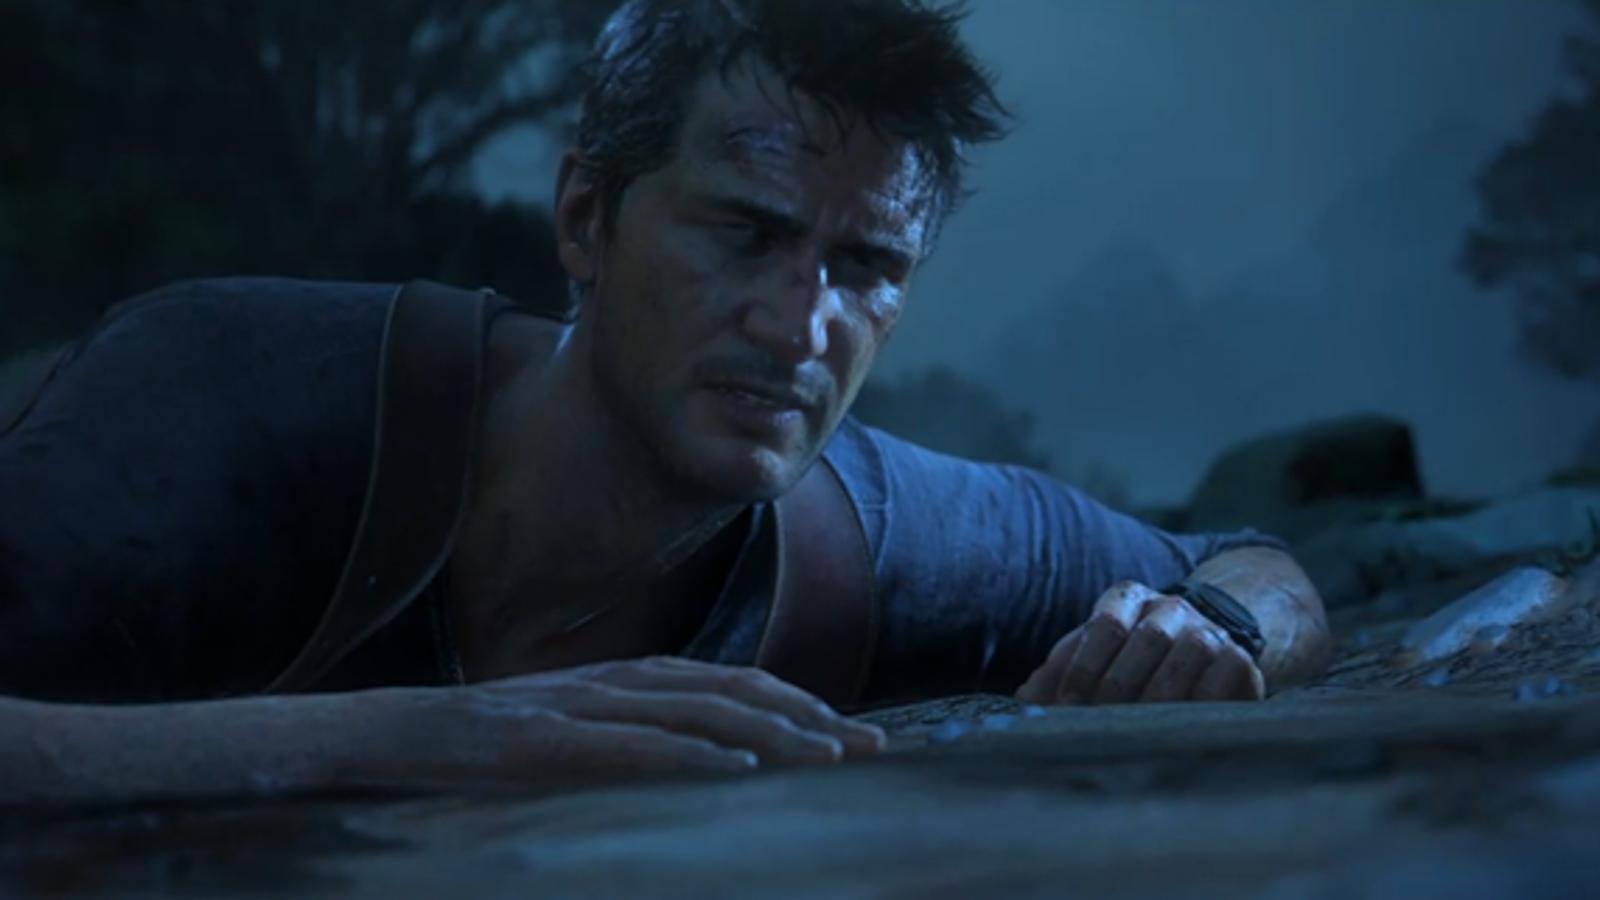 Primer tráiler de Uncharted 4. ¿Es el fin de Nathan Drake?